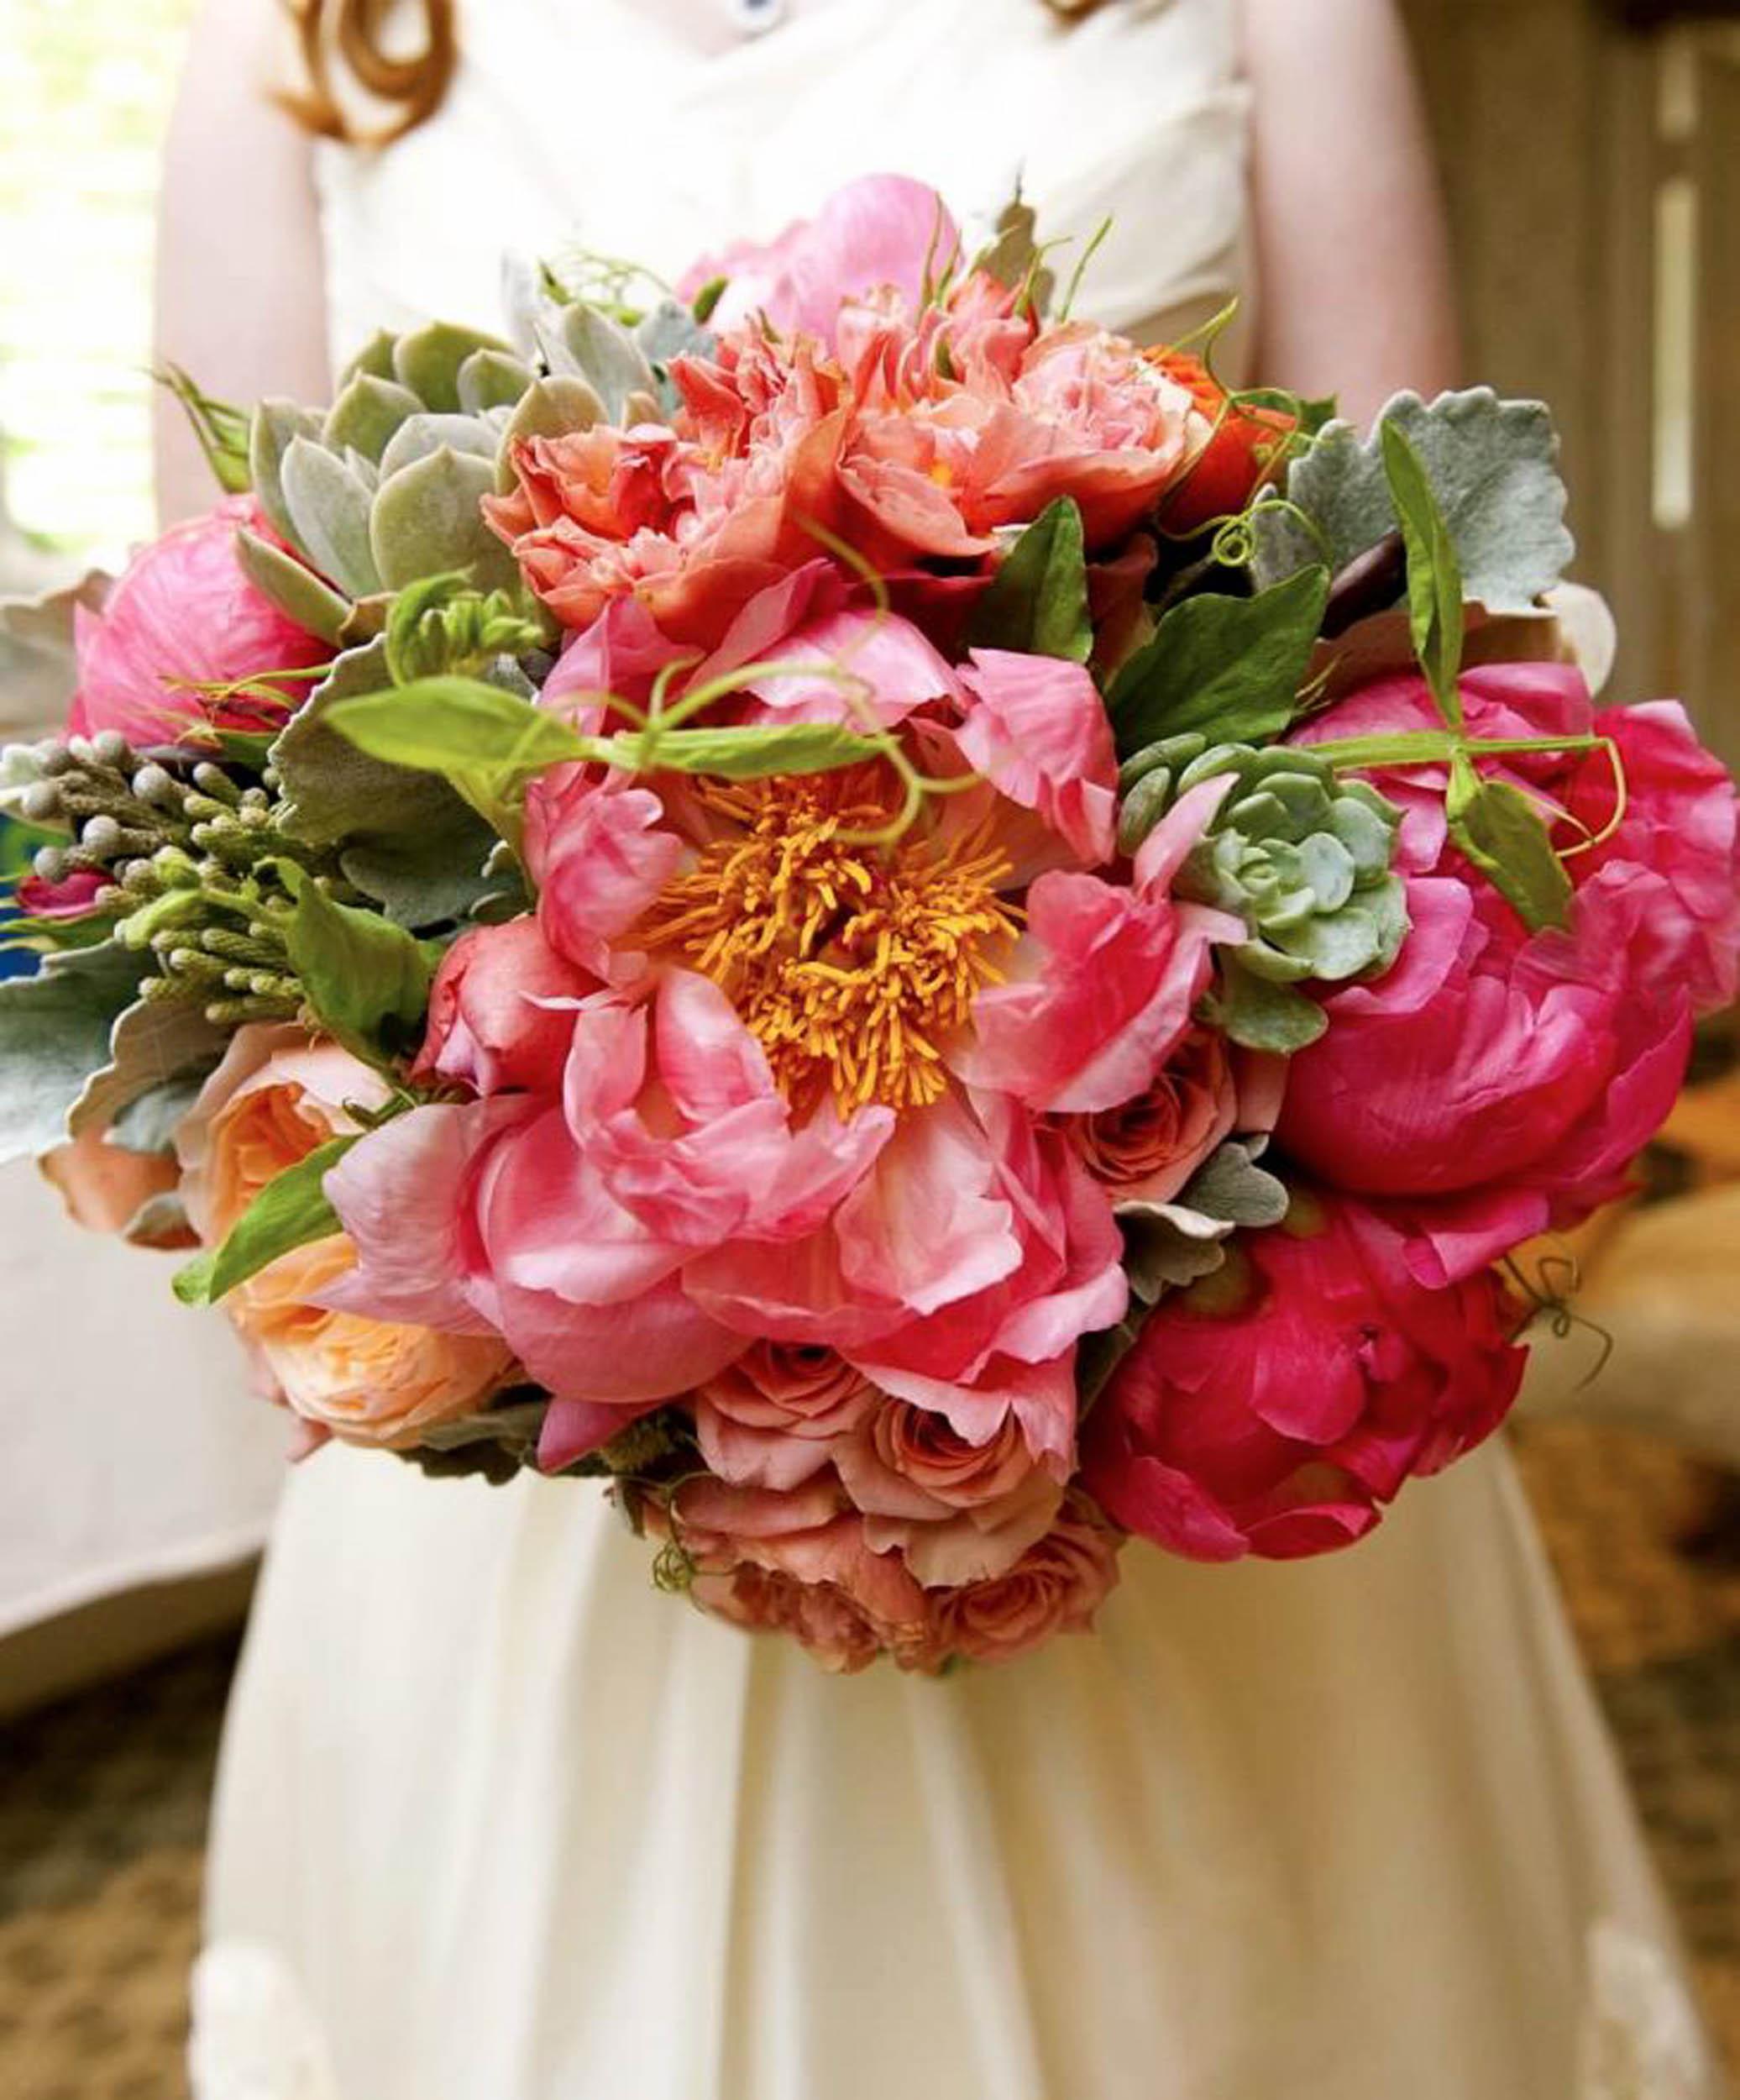 lilacs-florals-wedding-florist-bouquets-hires-020.jpg